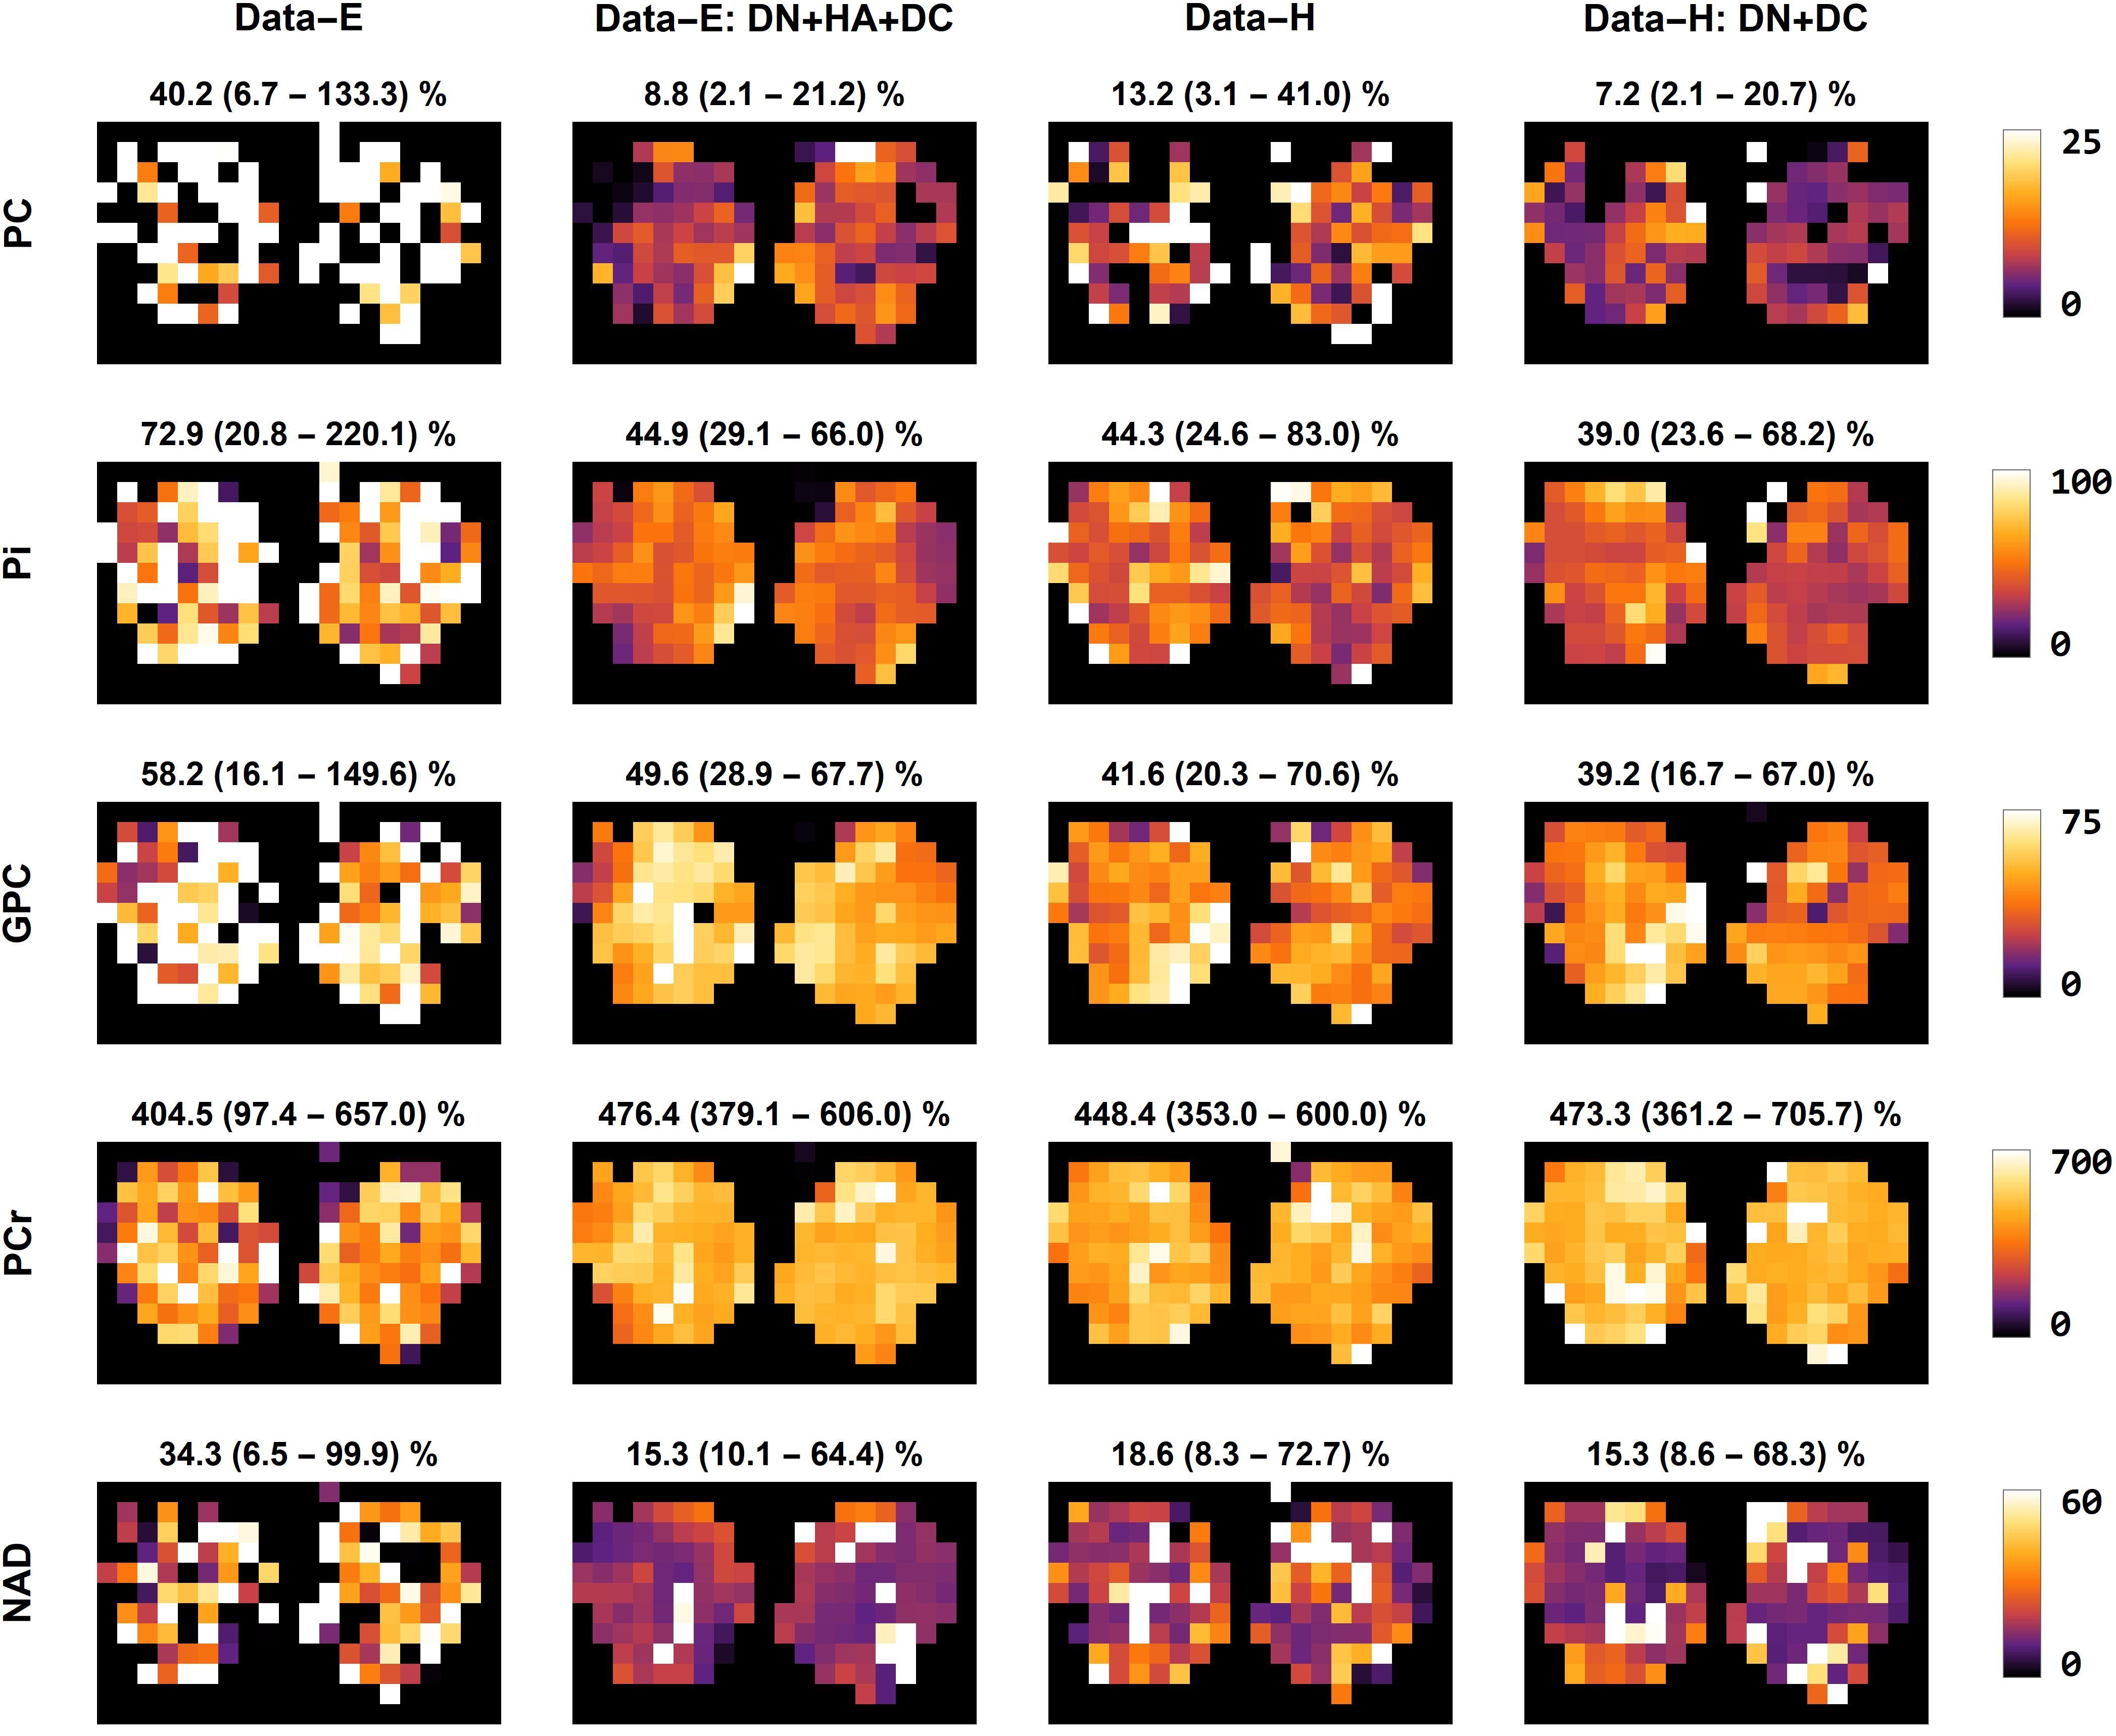 Data fitting metabolite maps